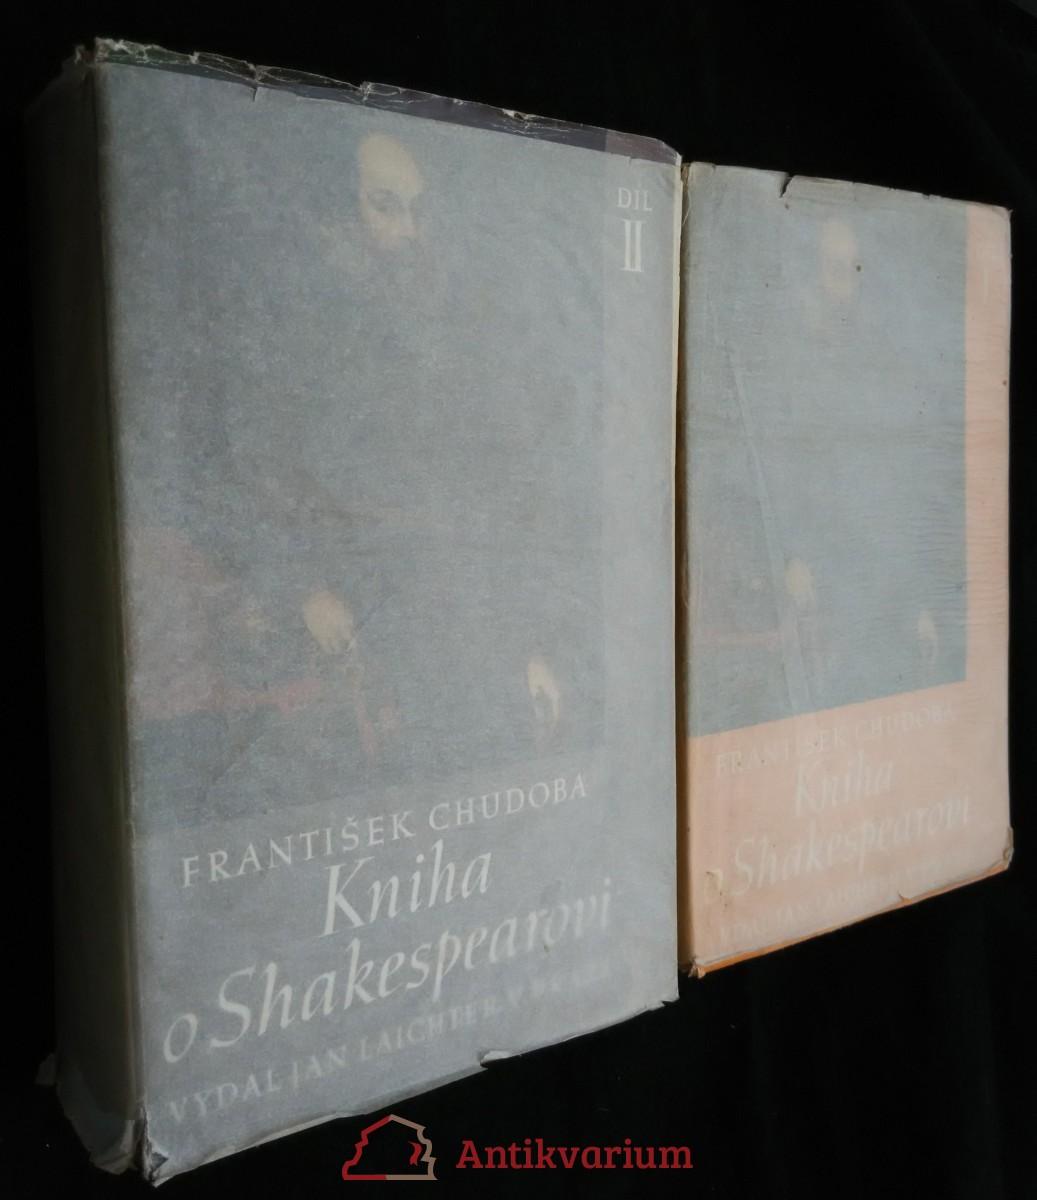 antikvární kniha Kniha o Shakespearovi. Díl I.-II., 1941- 1943